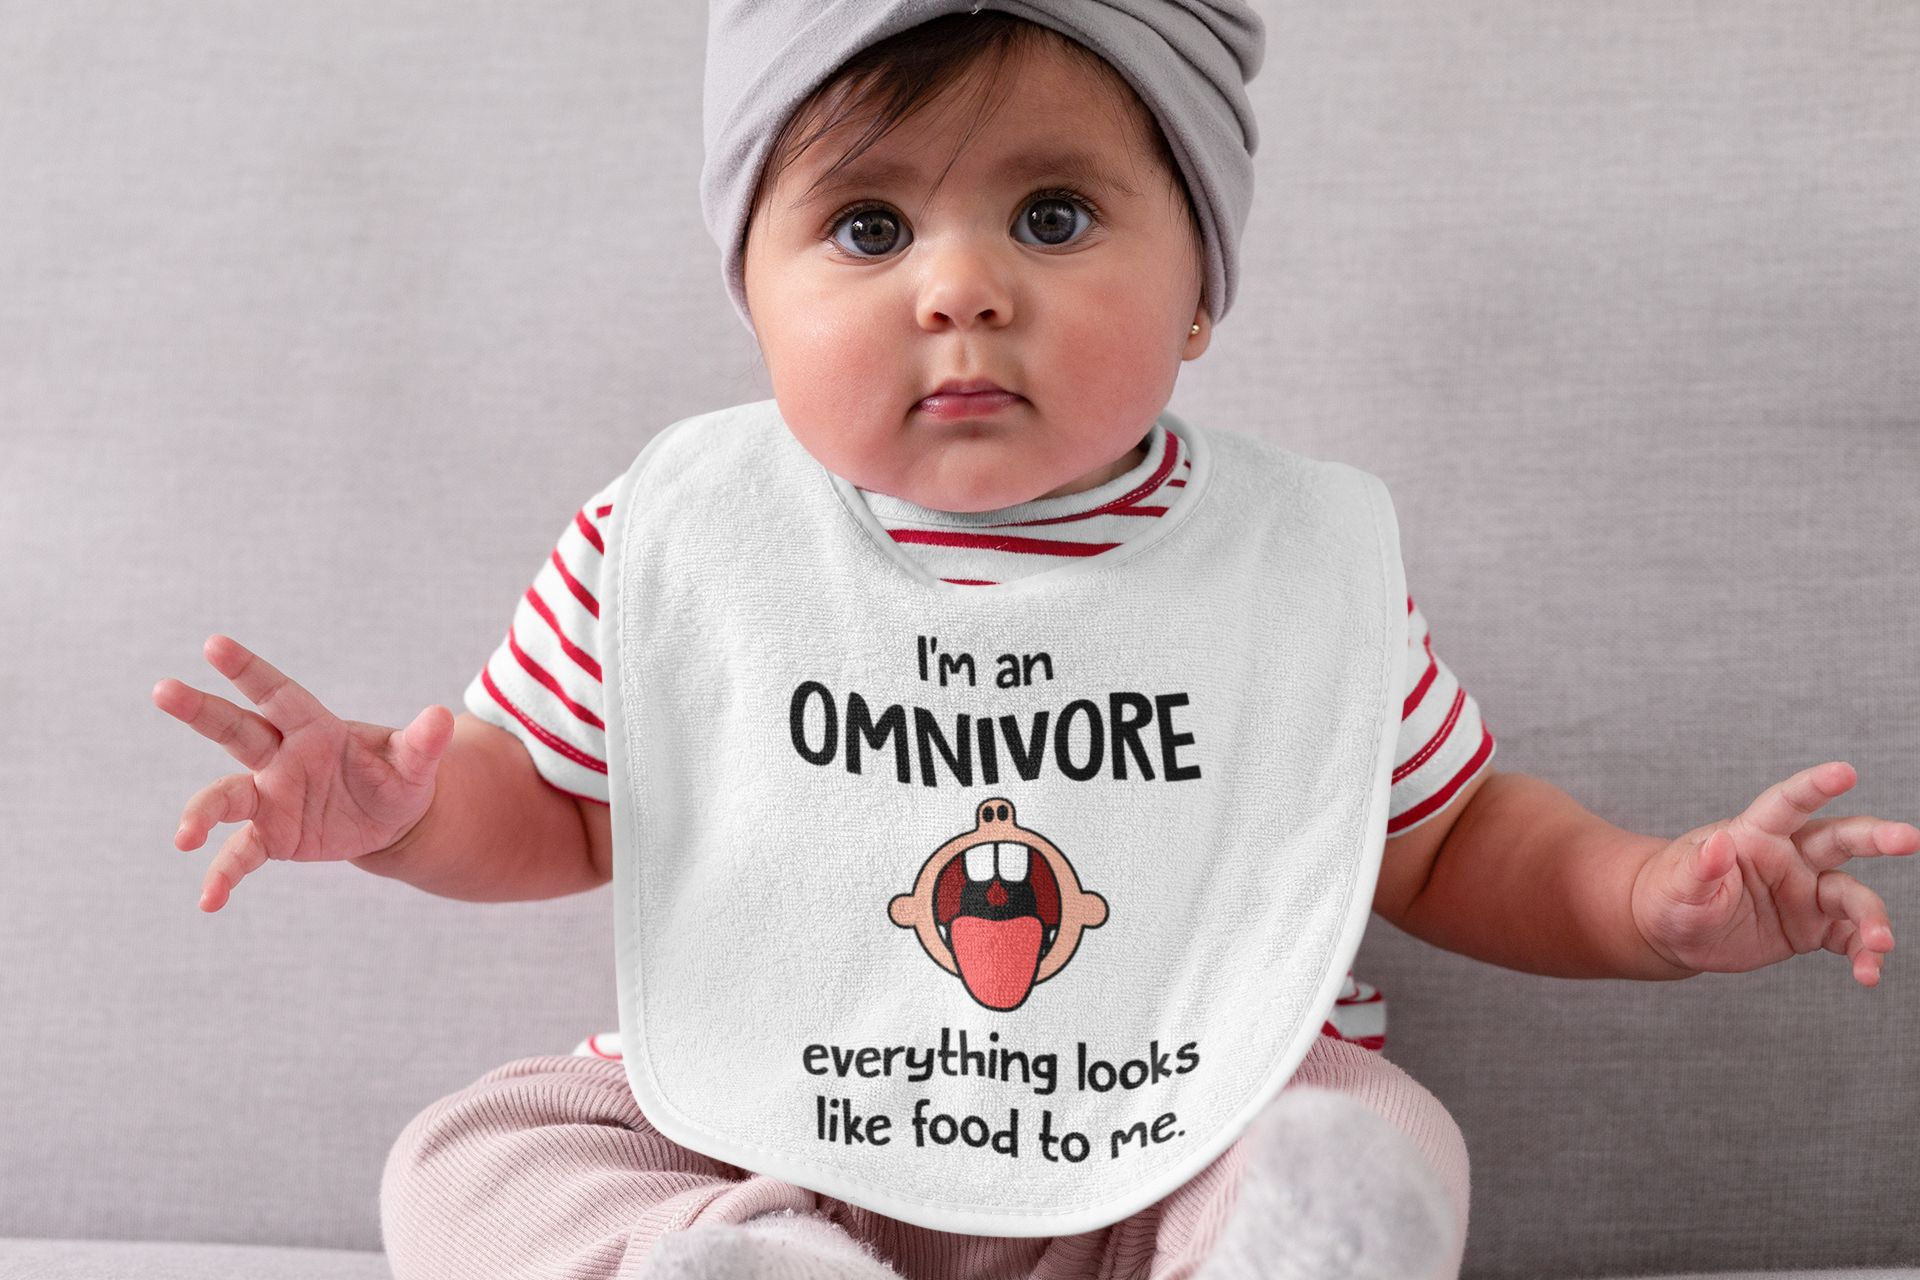 I'm an Omnivore